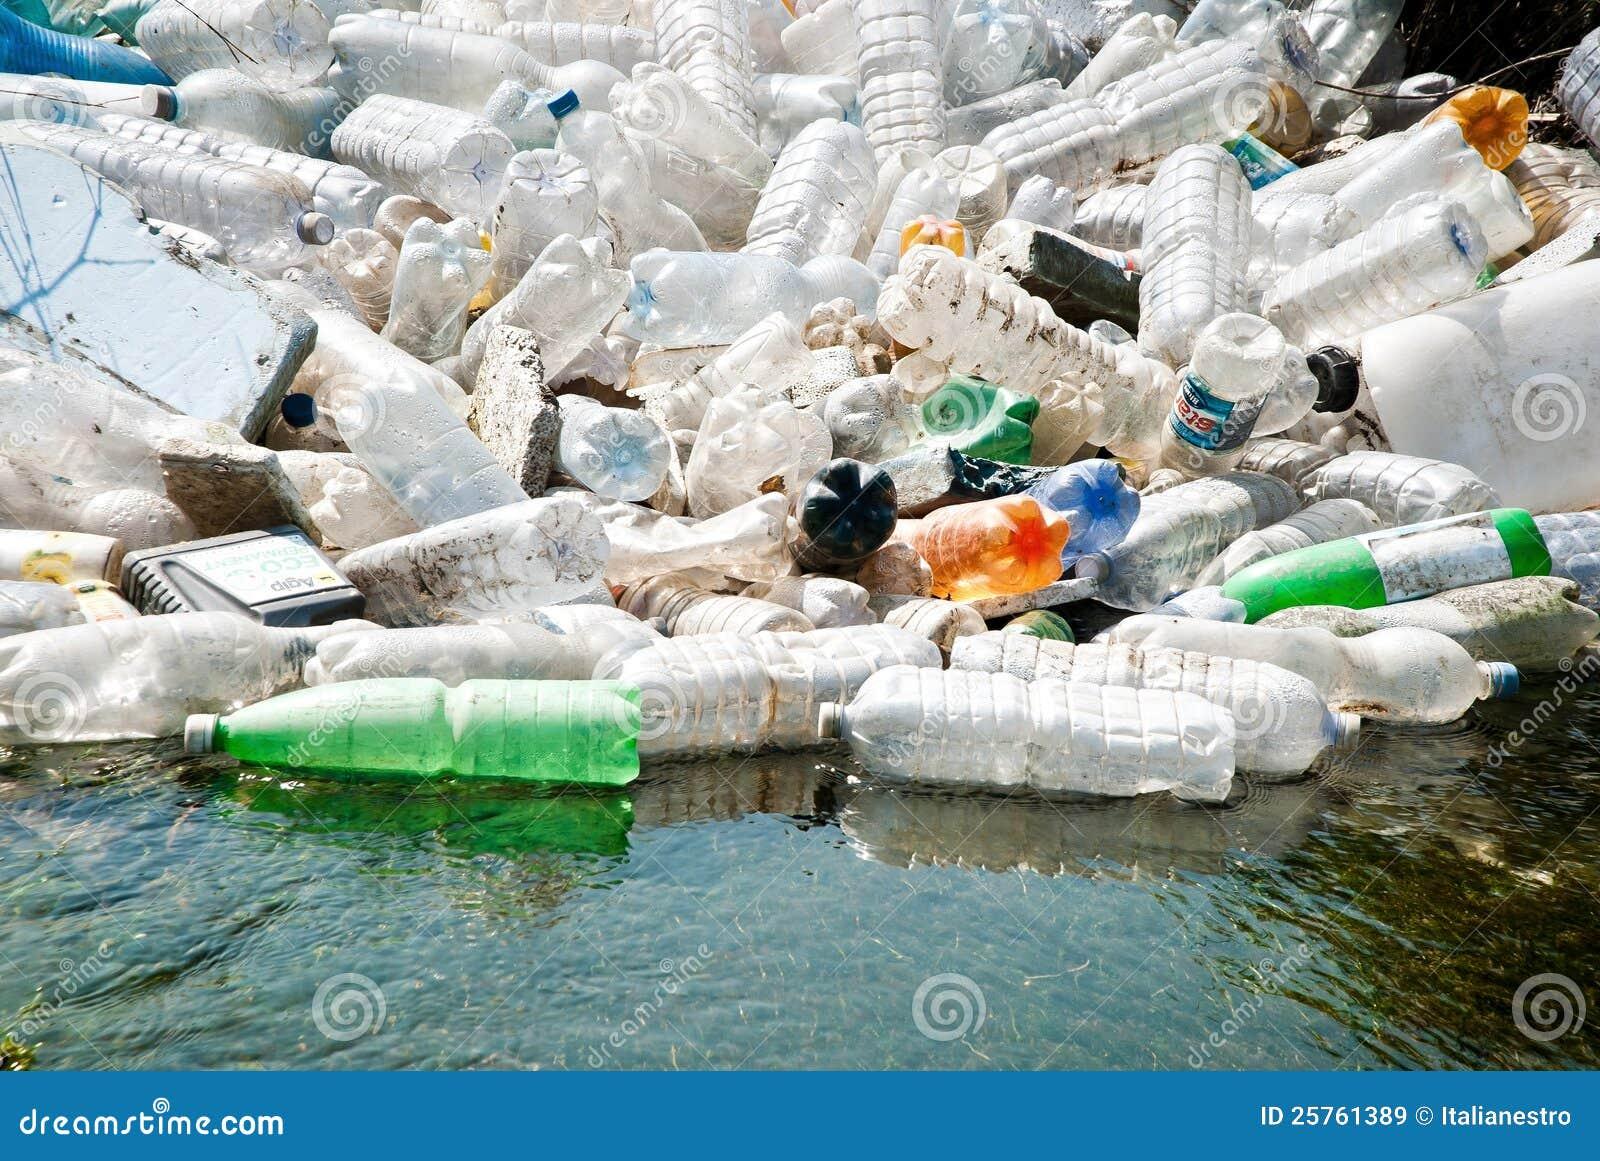 Plastikabfall